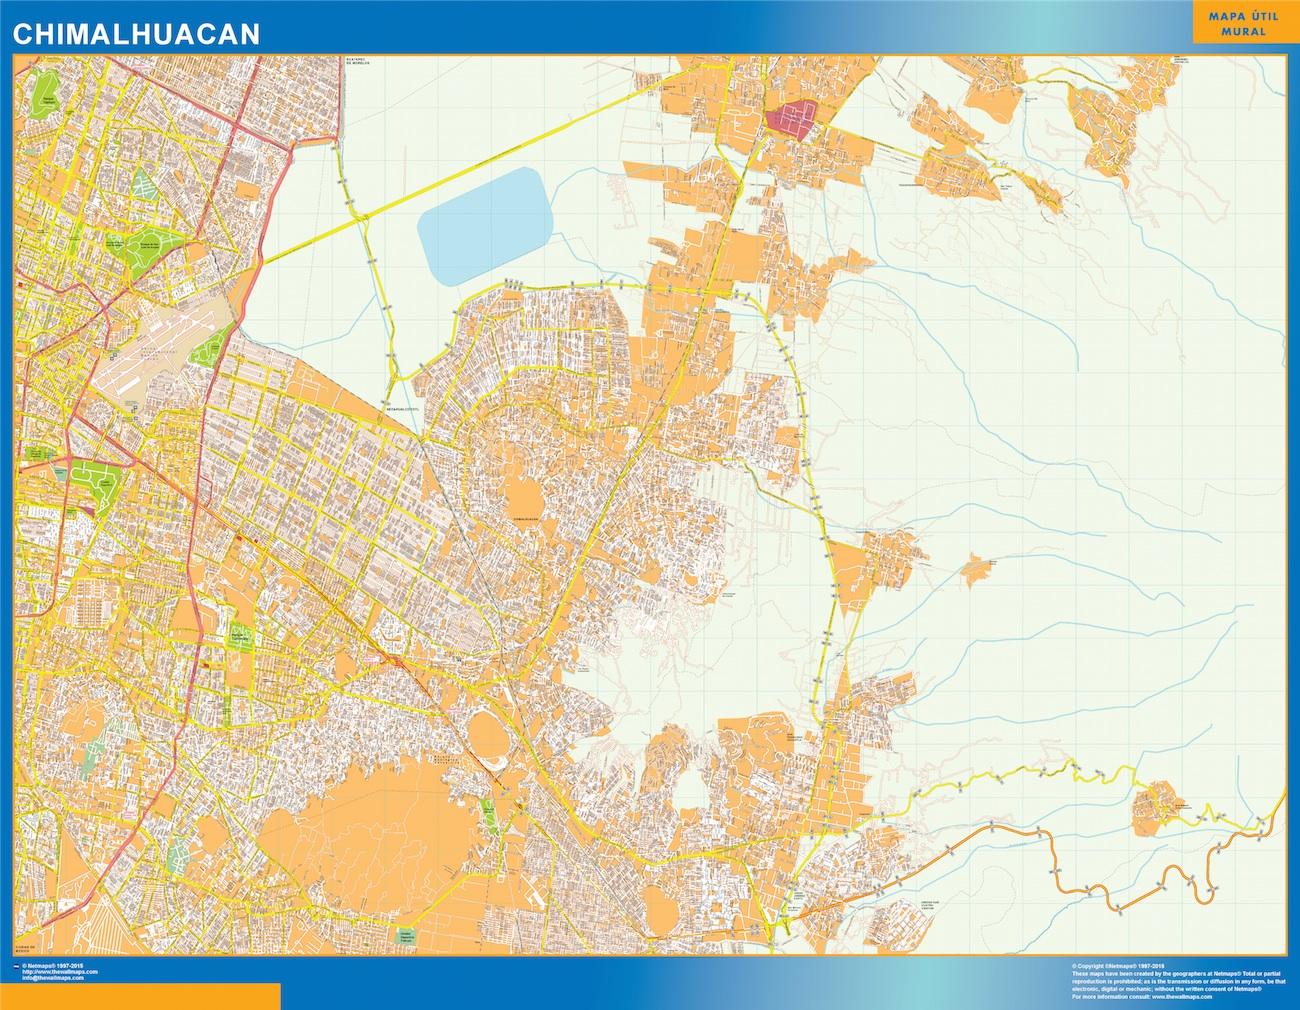 mapa Chimalhuacan